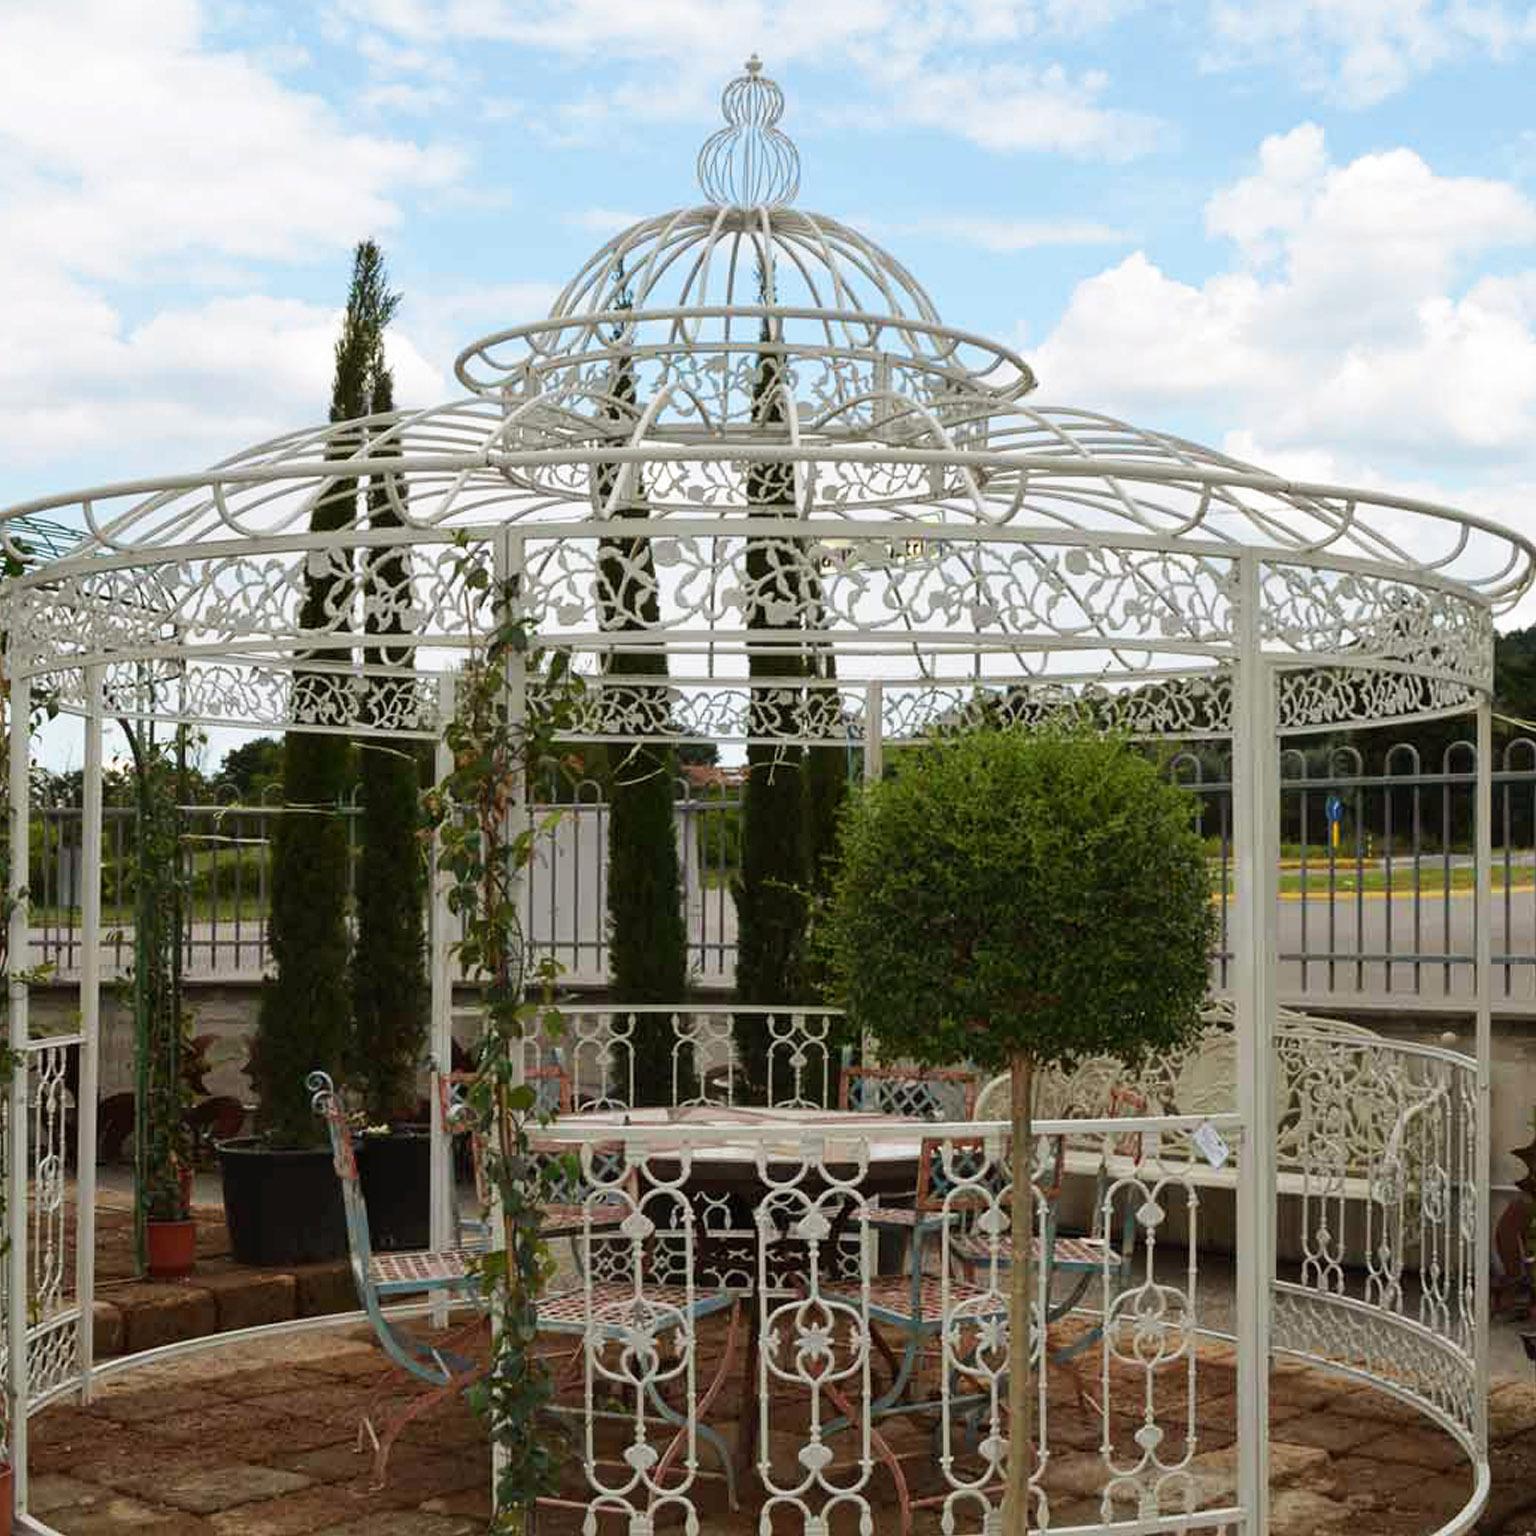 Full Size of Pavillon Aus Eisen Pietre E Arredi Giardino Antiquitten Garten Wohnzimmer Pavillon Eisen